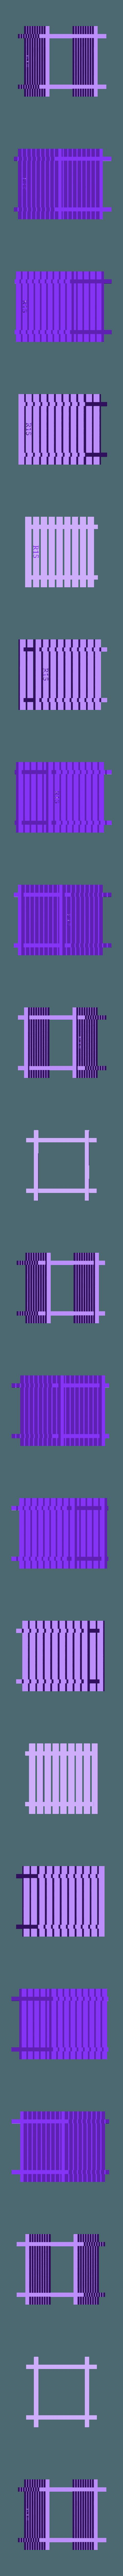 caja.stl Download free STL file Box • 3D printing object, Raulbaeza15